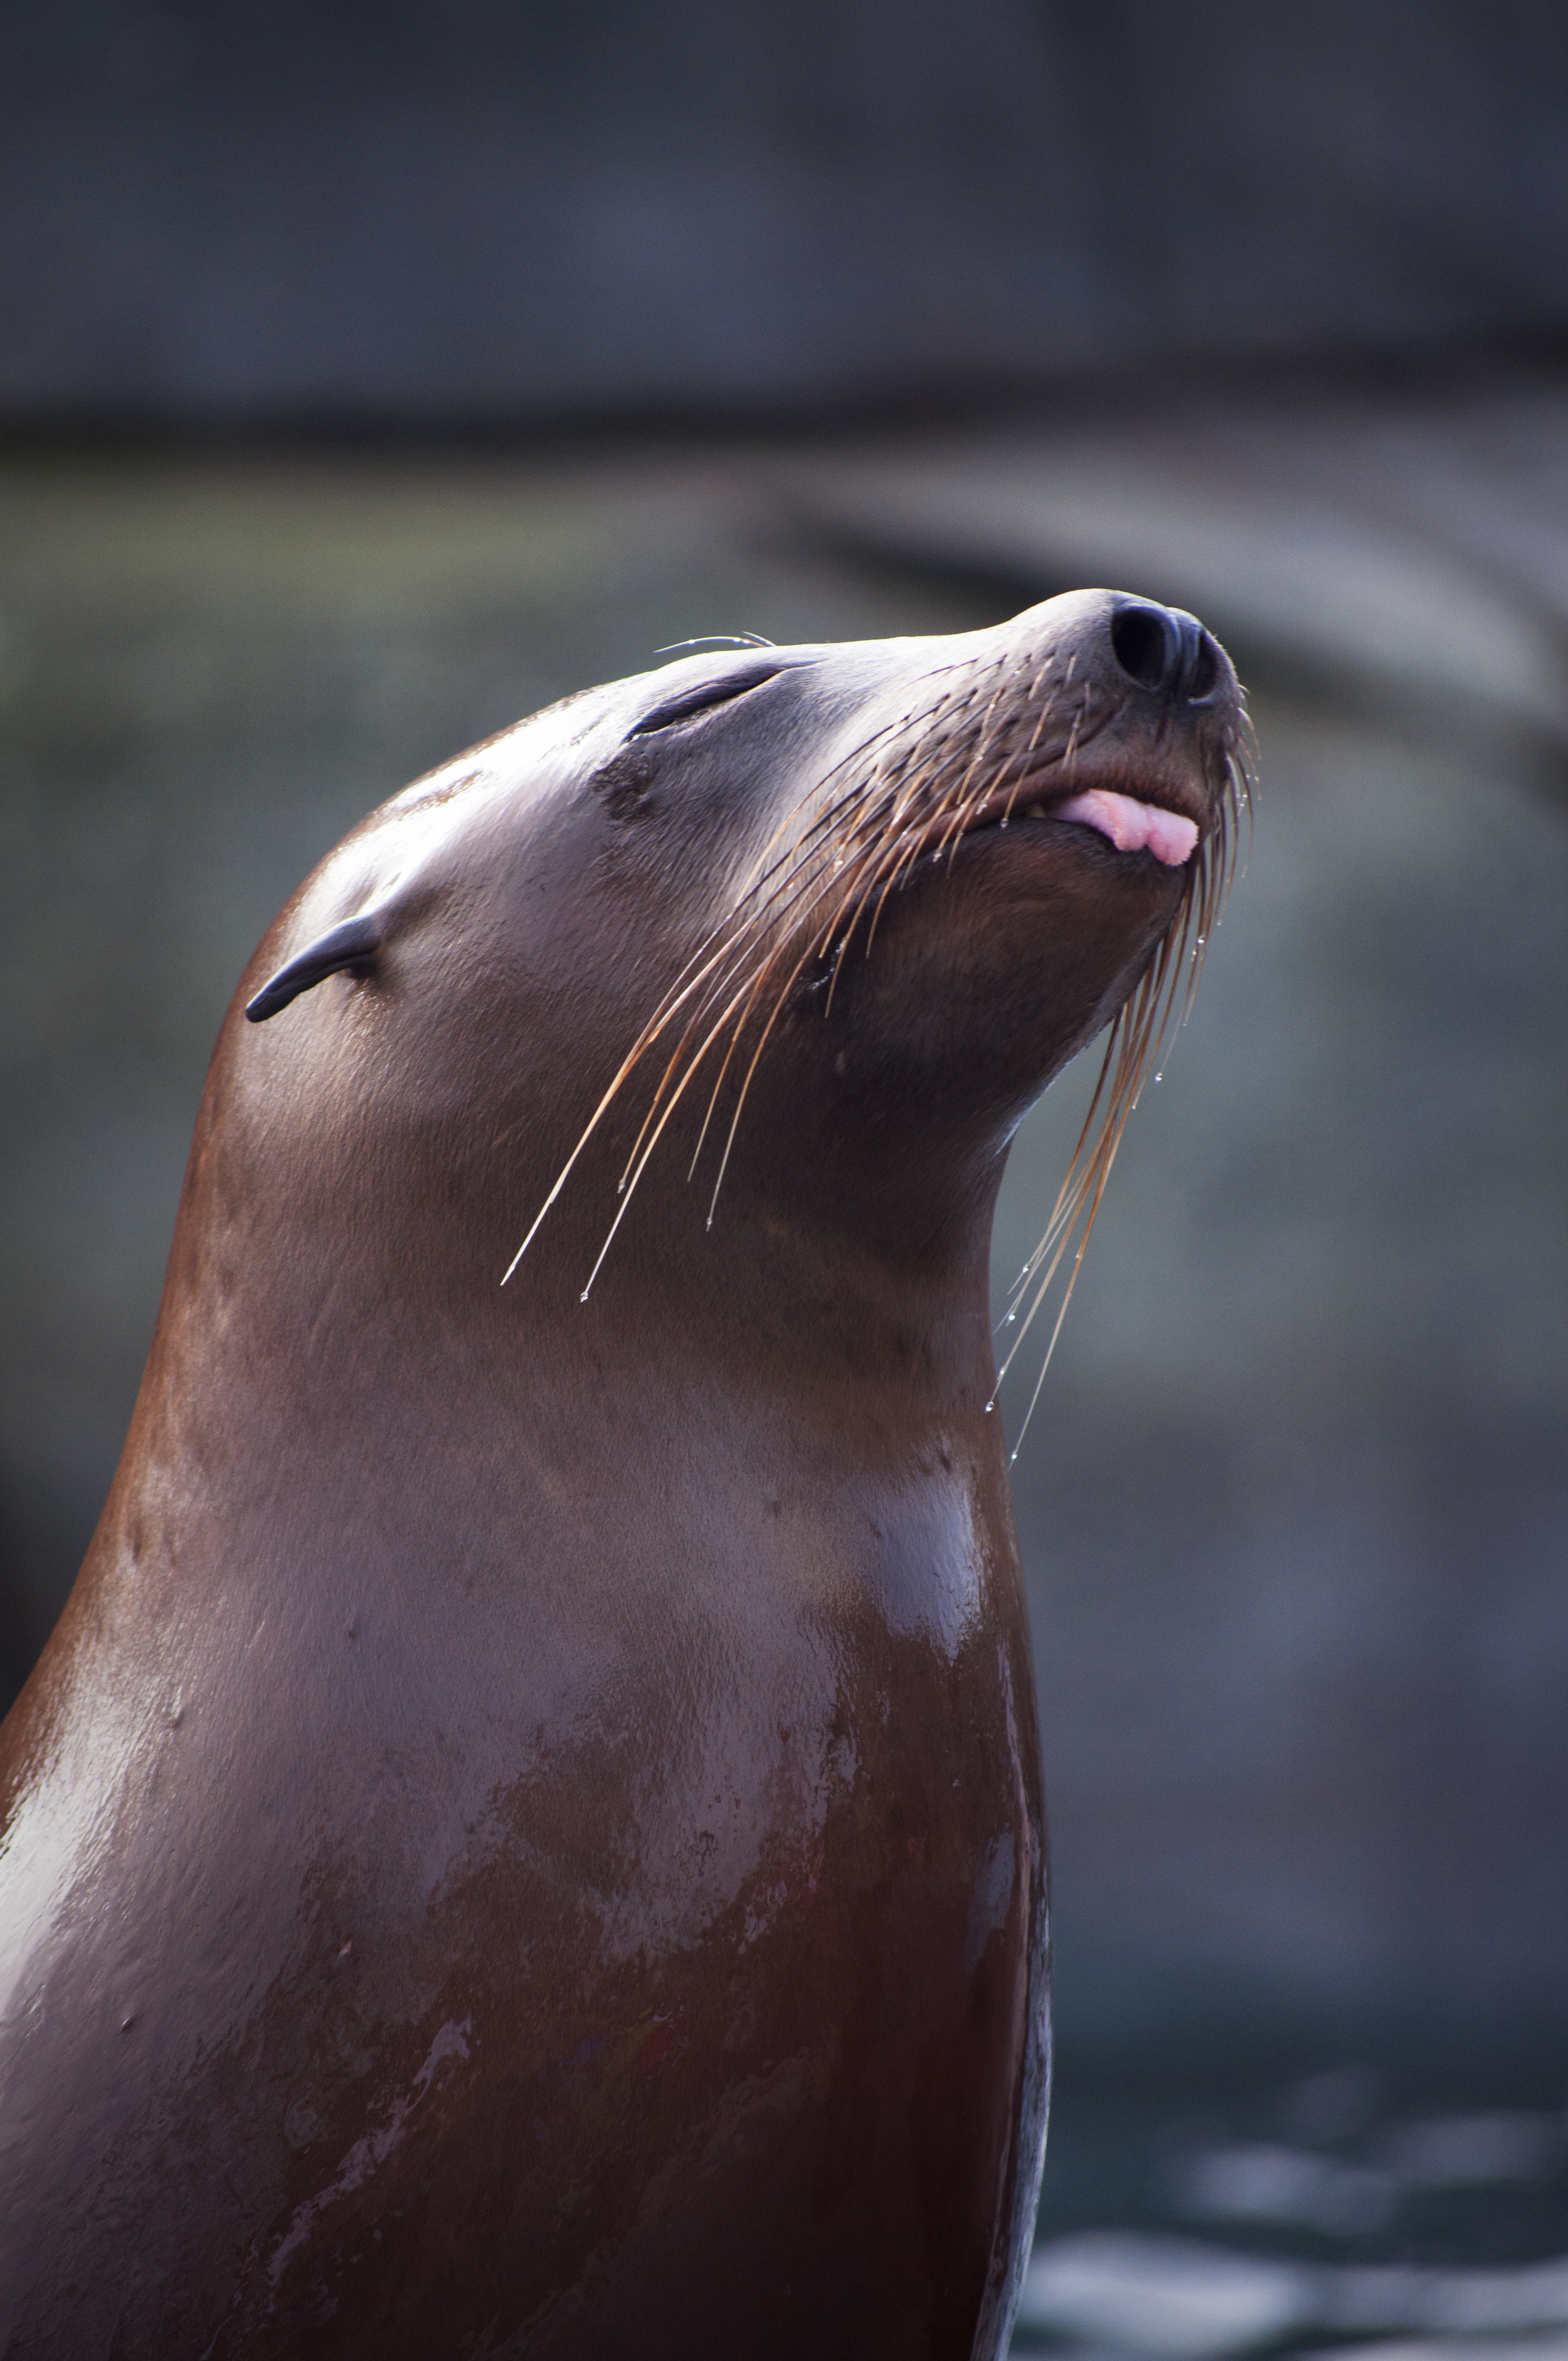 Sea lion, St. Louis Zoo